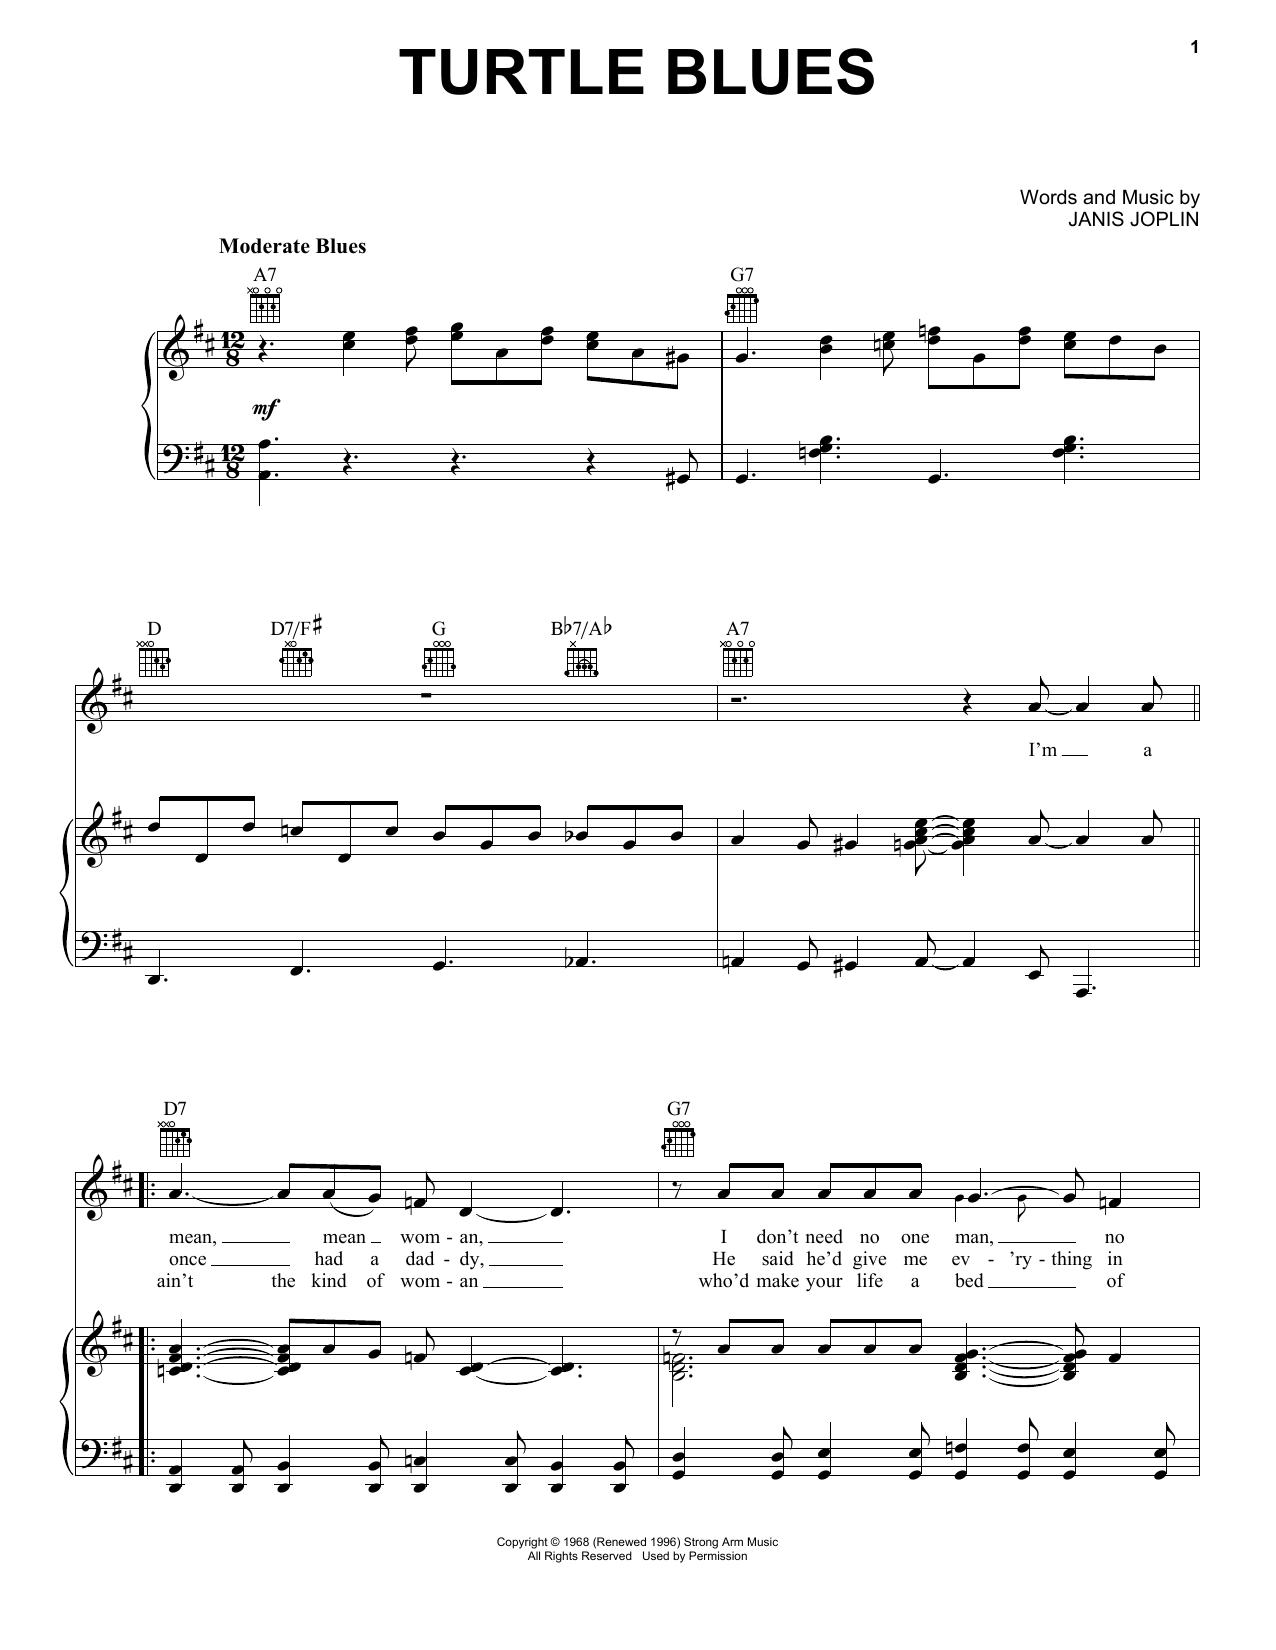 Turtle blues sheet music direct for Janis joplin mercedes benz lyrics